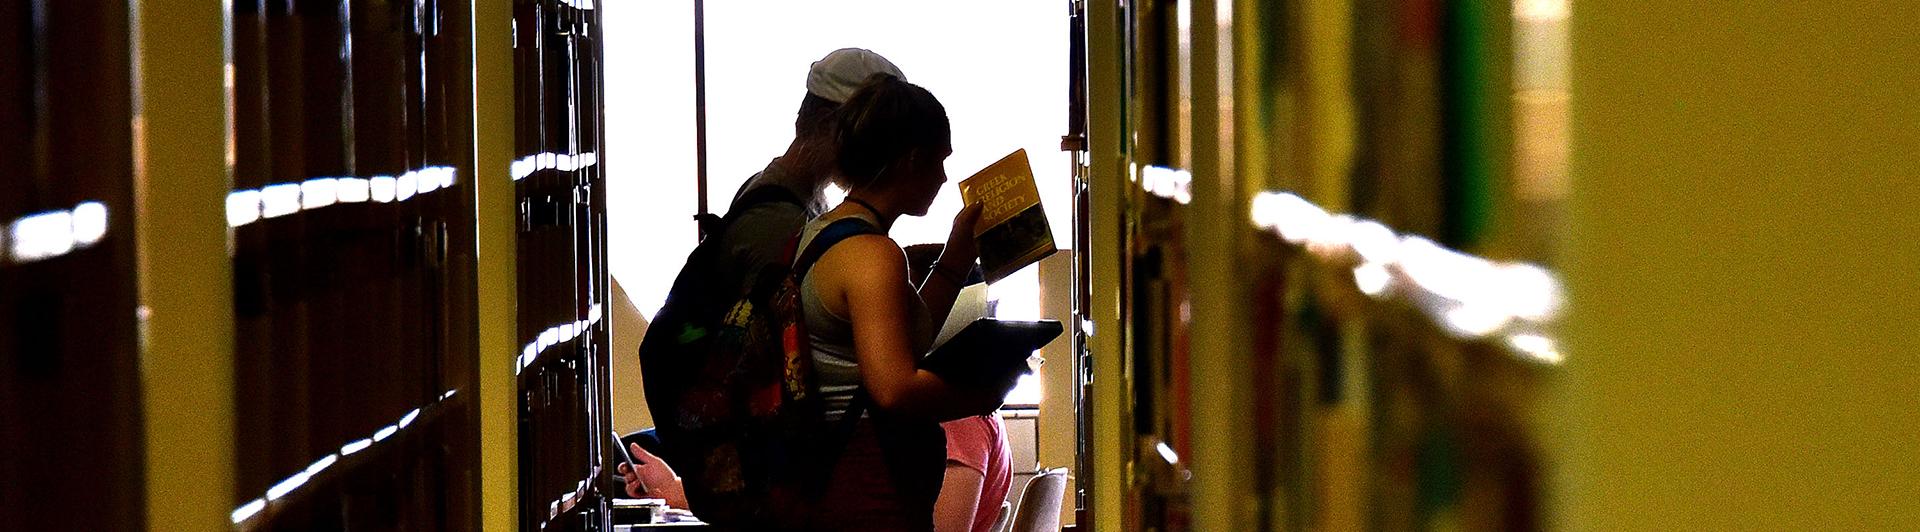 UFS Sasol Library